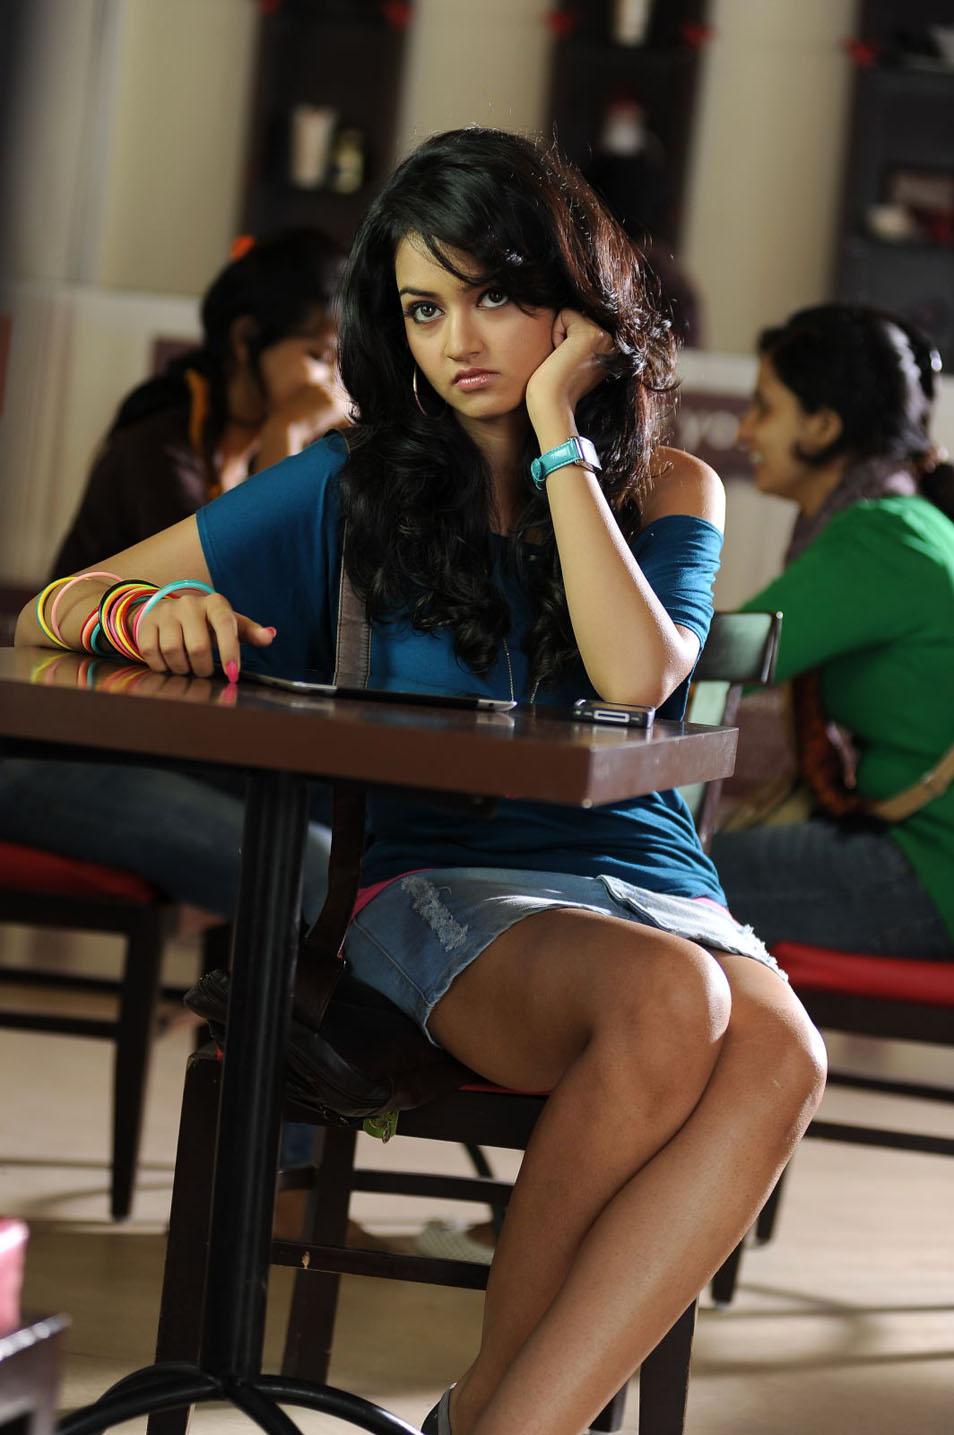 Shanvi from Adda Movie Photo Gallery Shanvi11